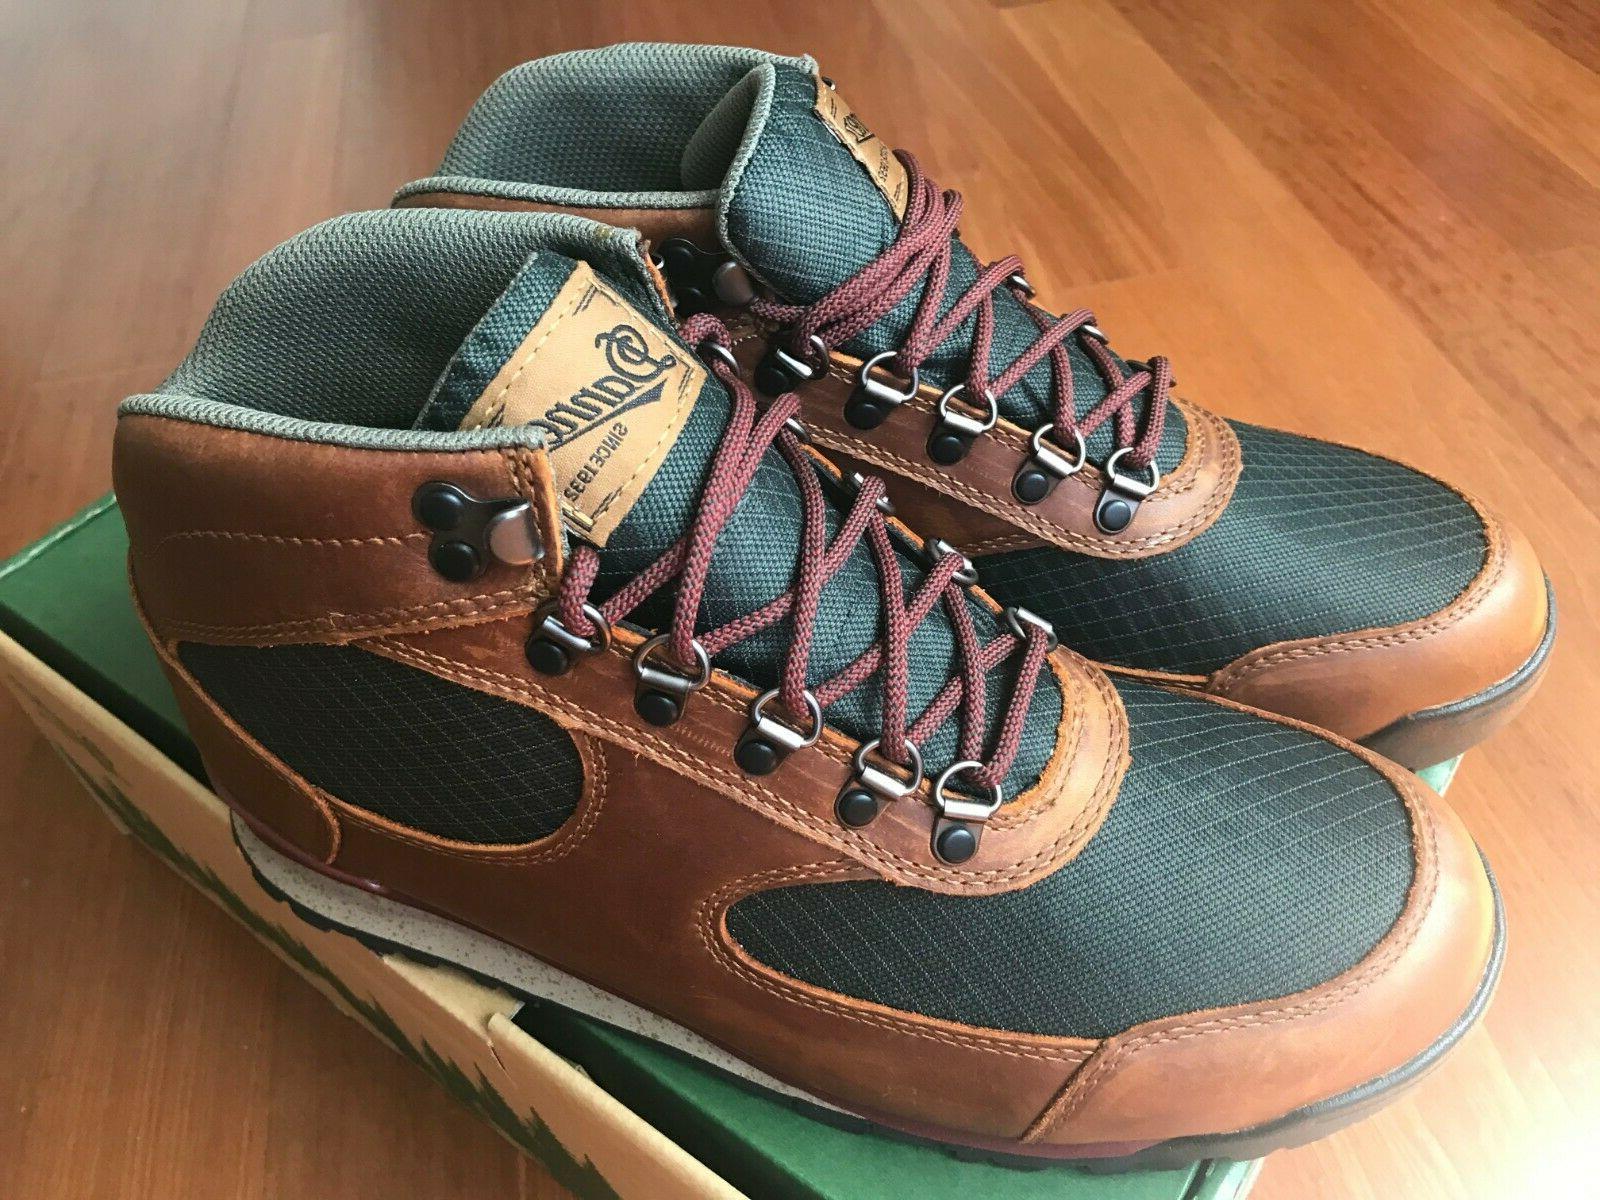 Danner Jag Hiking Boots, Green, Sz 32224